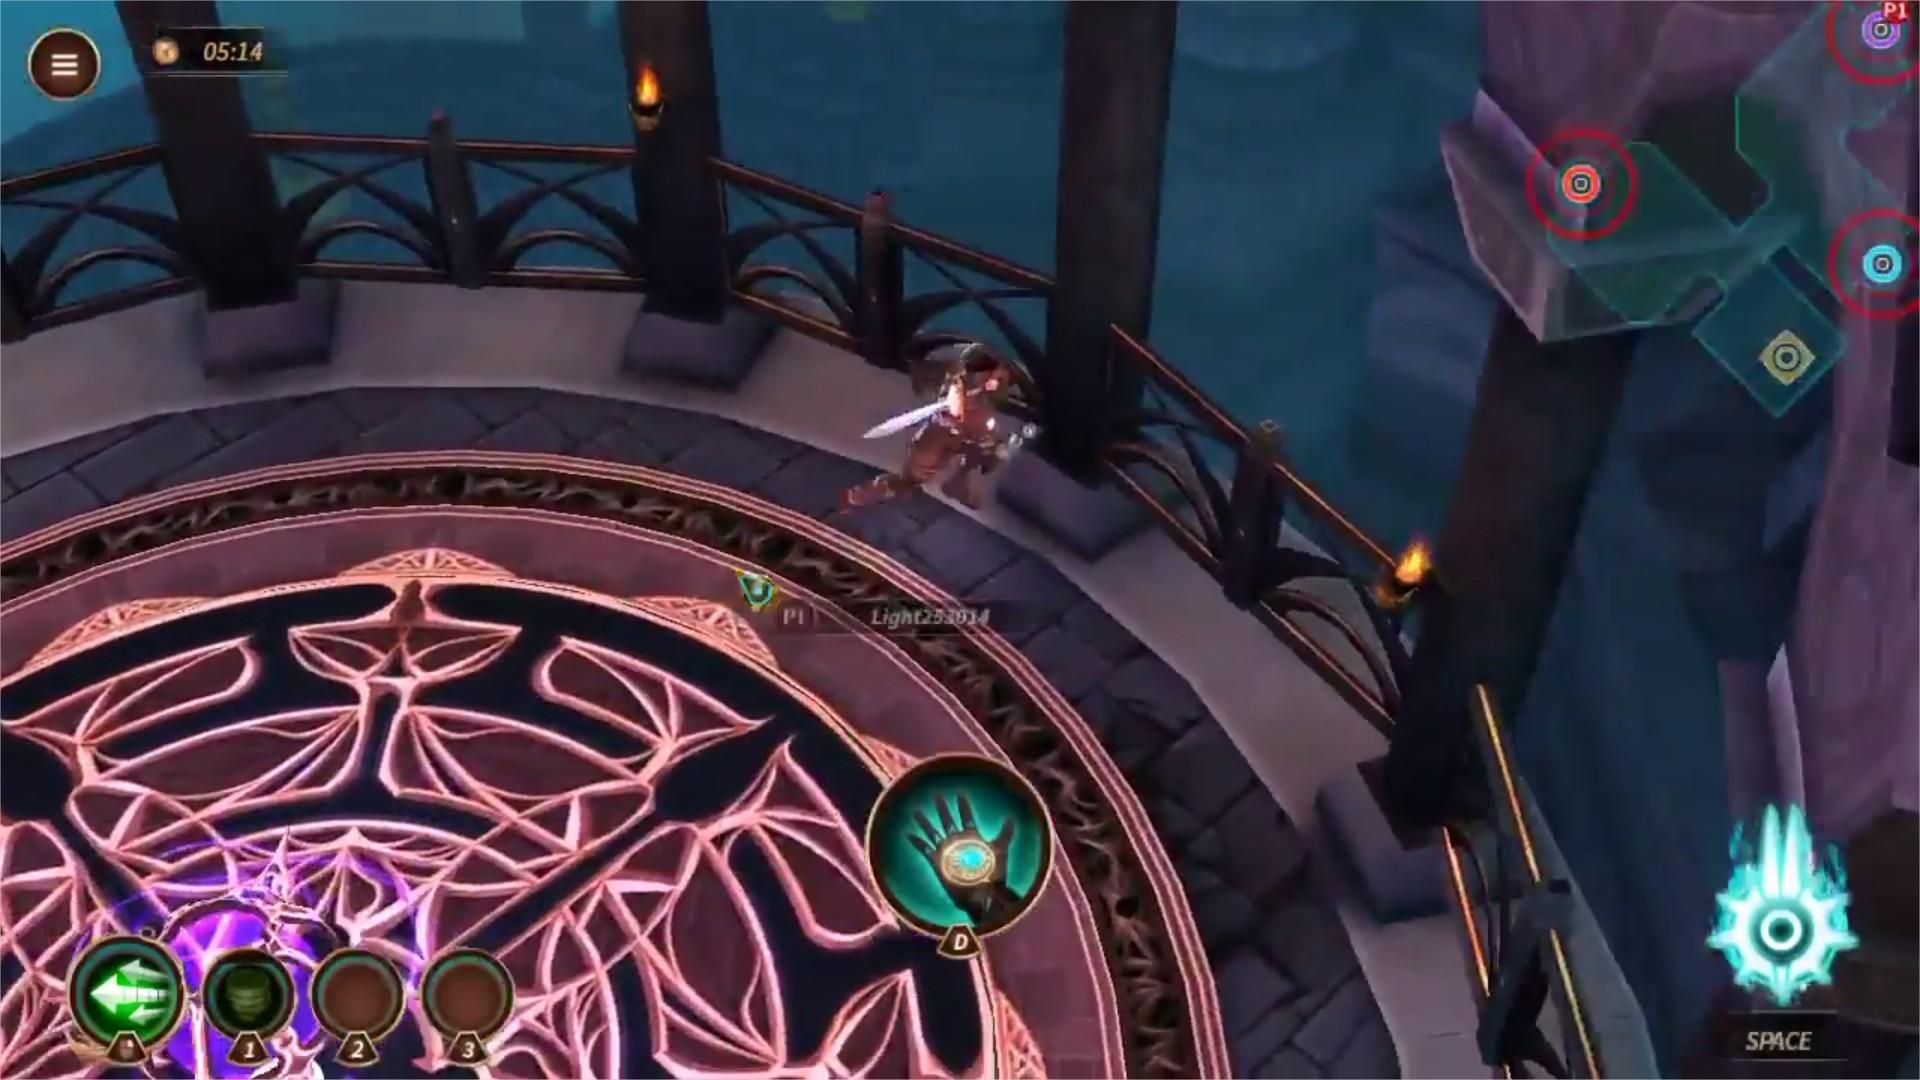 Lightbringers Saviours of Raia - Facebook gameplay PlayRawNow - YouTube - Opera_5.jpg